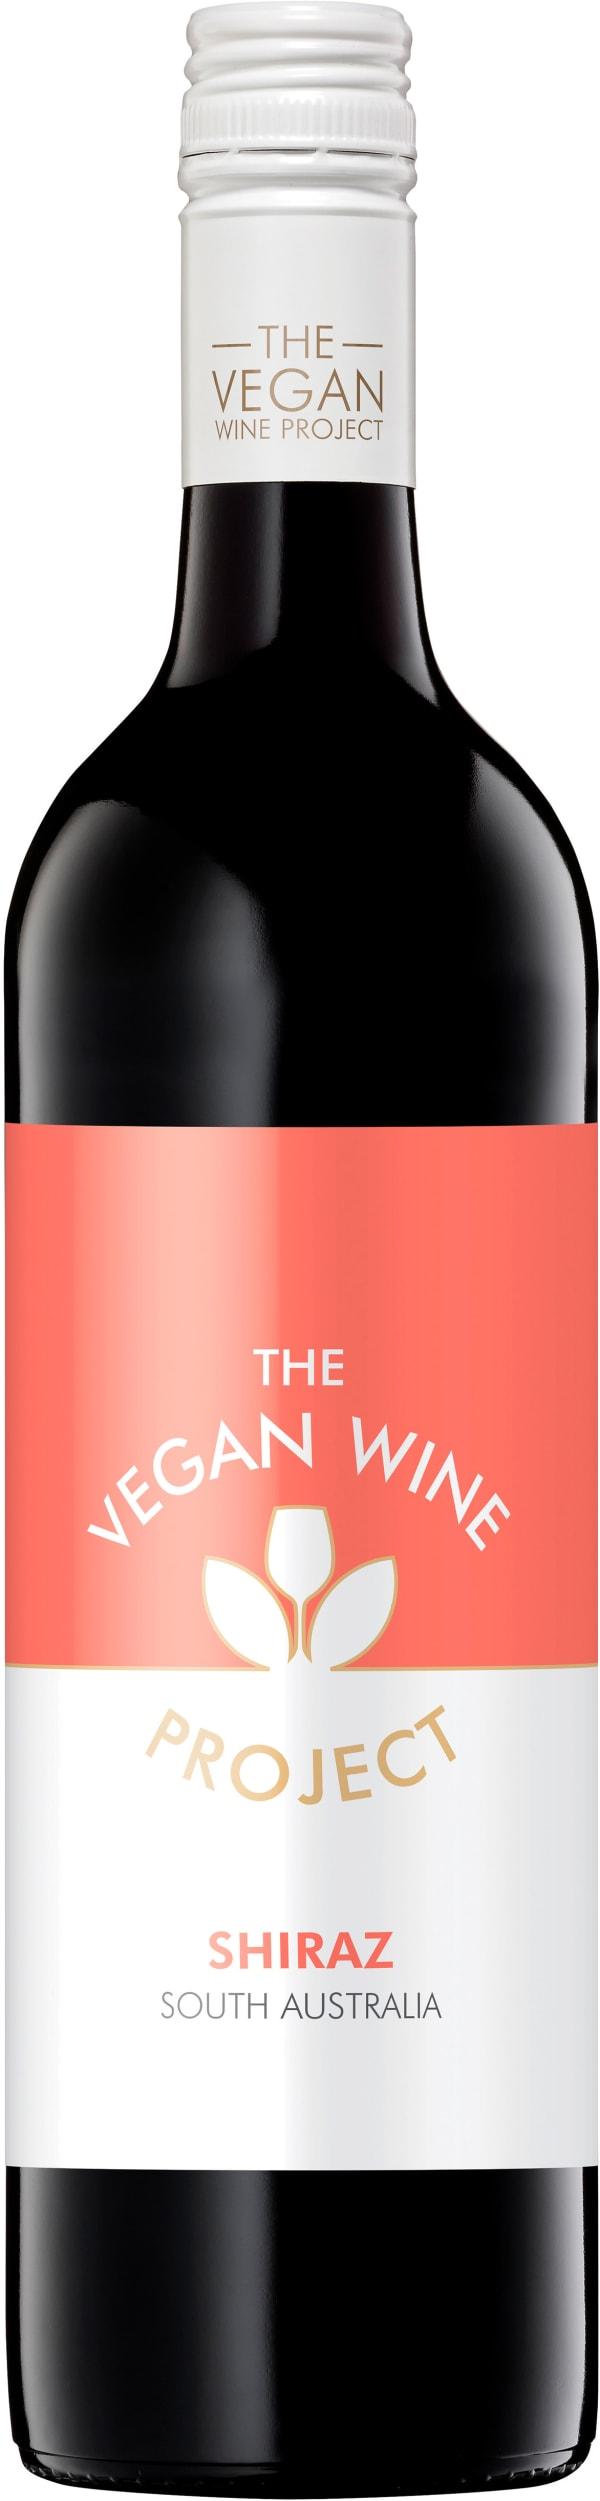 Yalumba The Vegan Wine Project Shiraz 2018